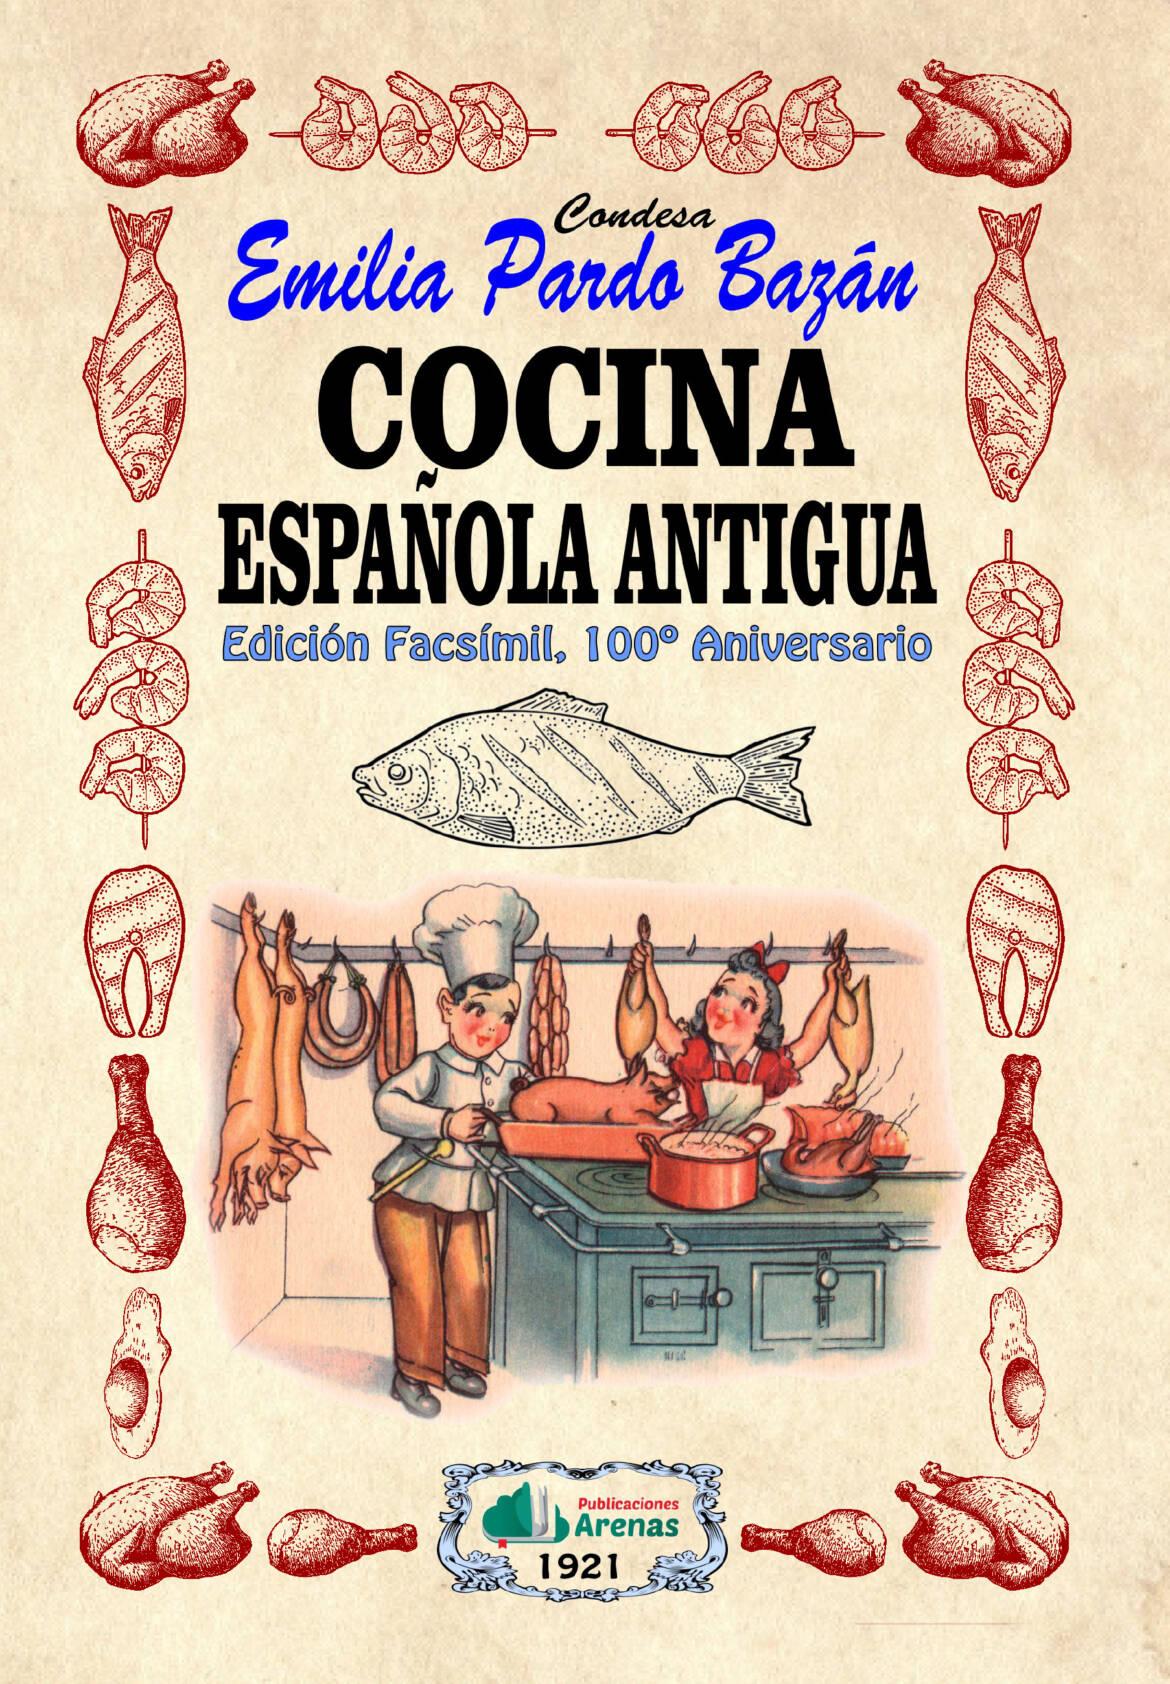 Portadas-Cocina-Emilia-Pardo-Bazan-1.jpg